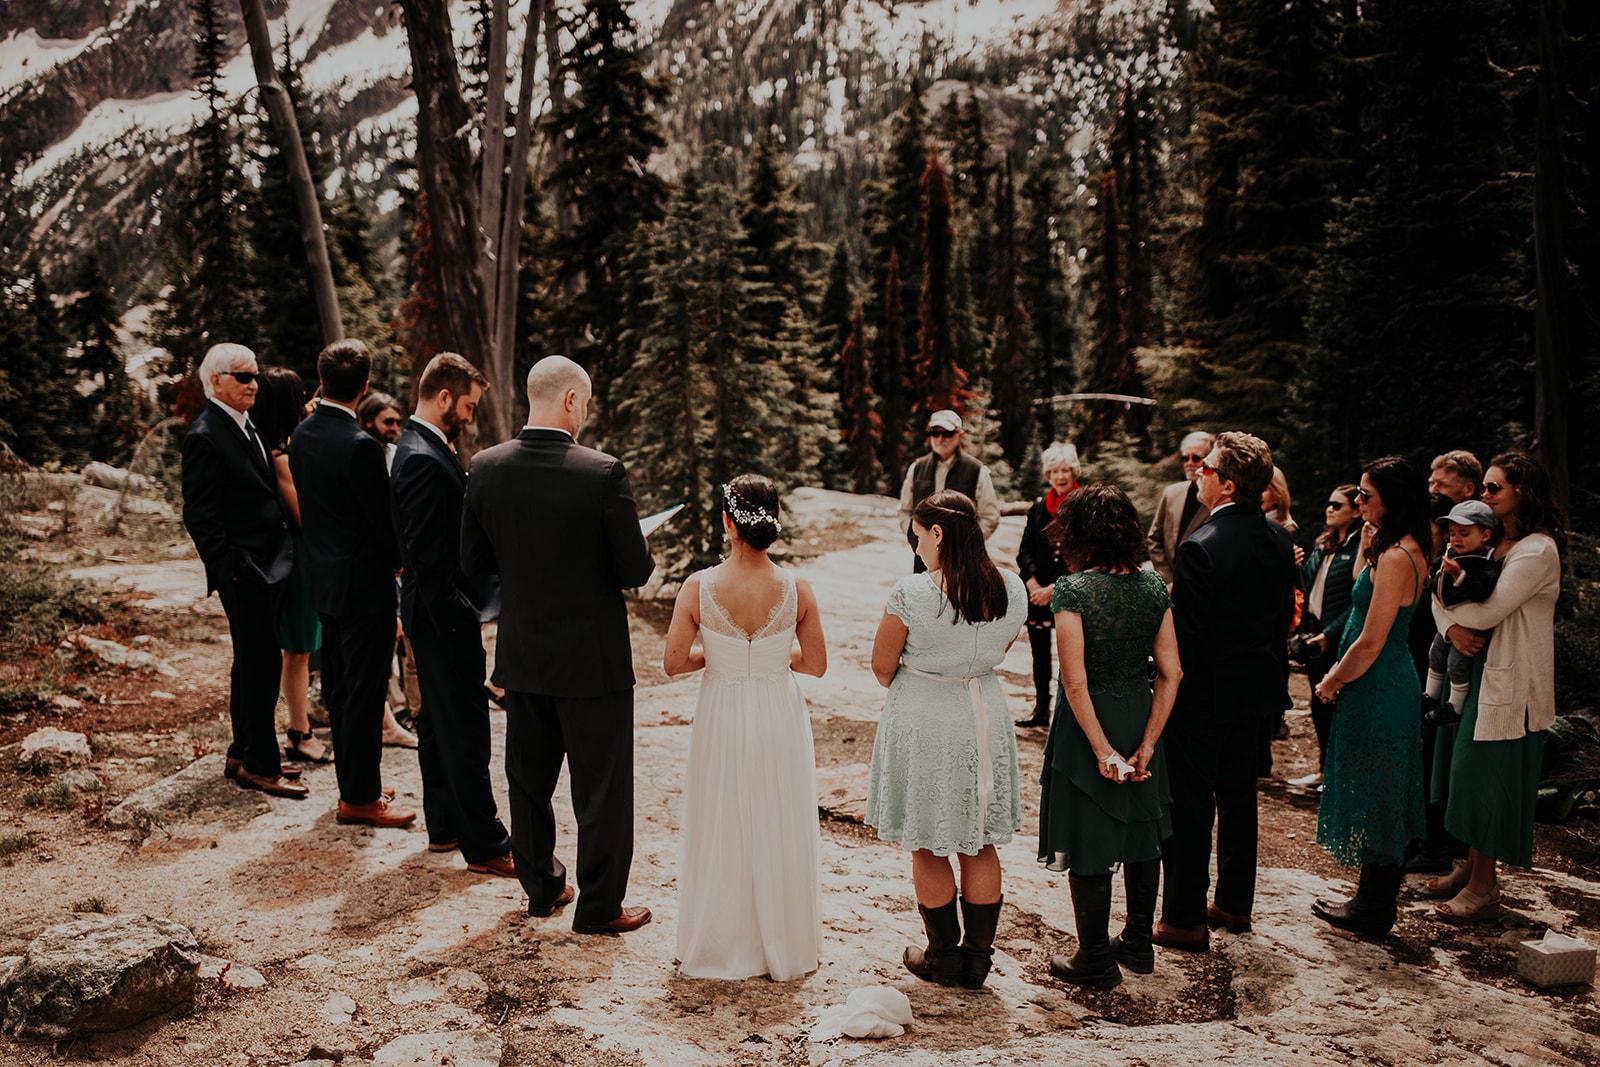 winthrop-wedding-photographer-megan-gallagher-photography (11).jpg